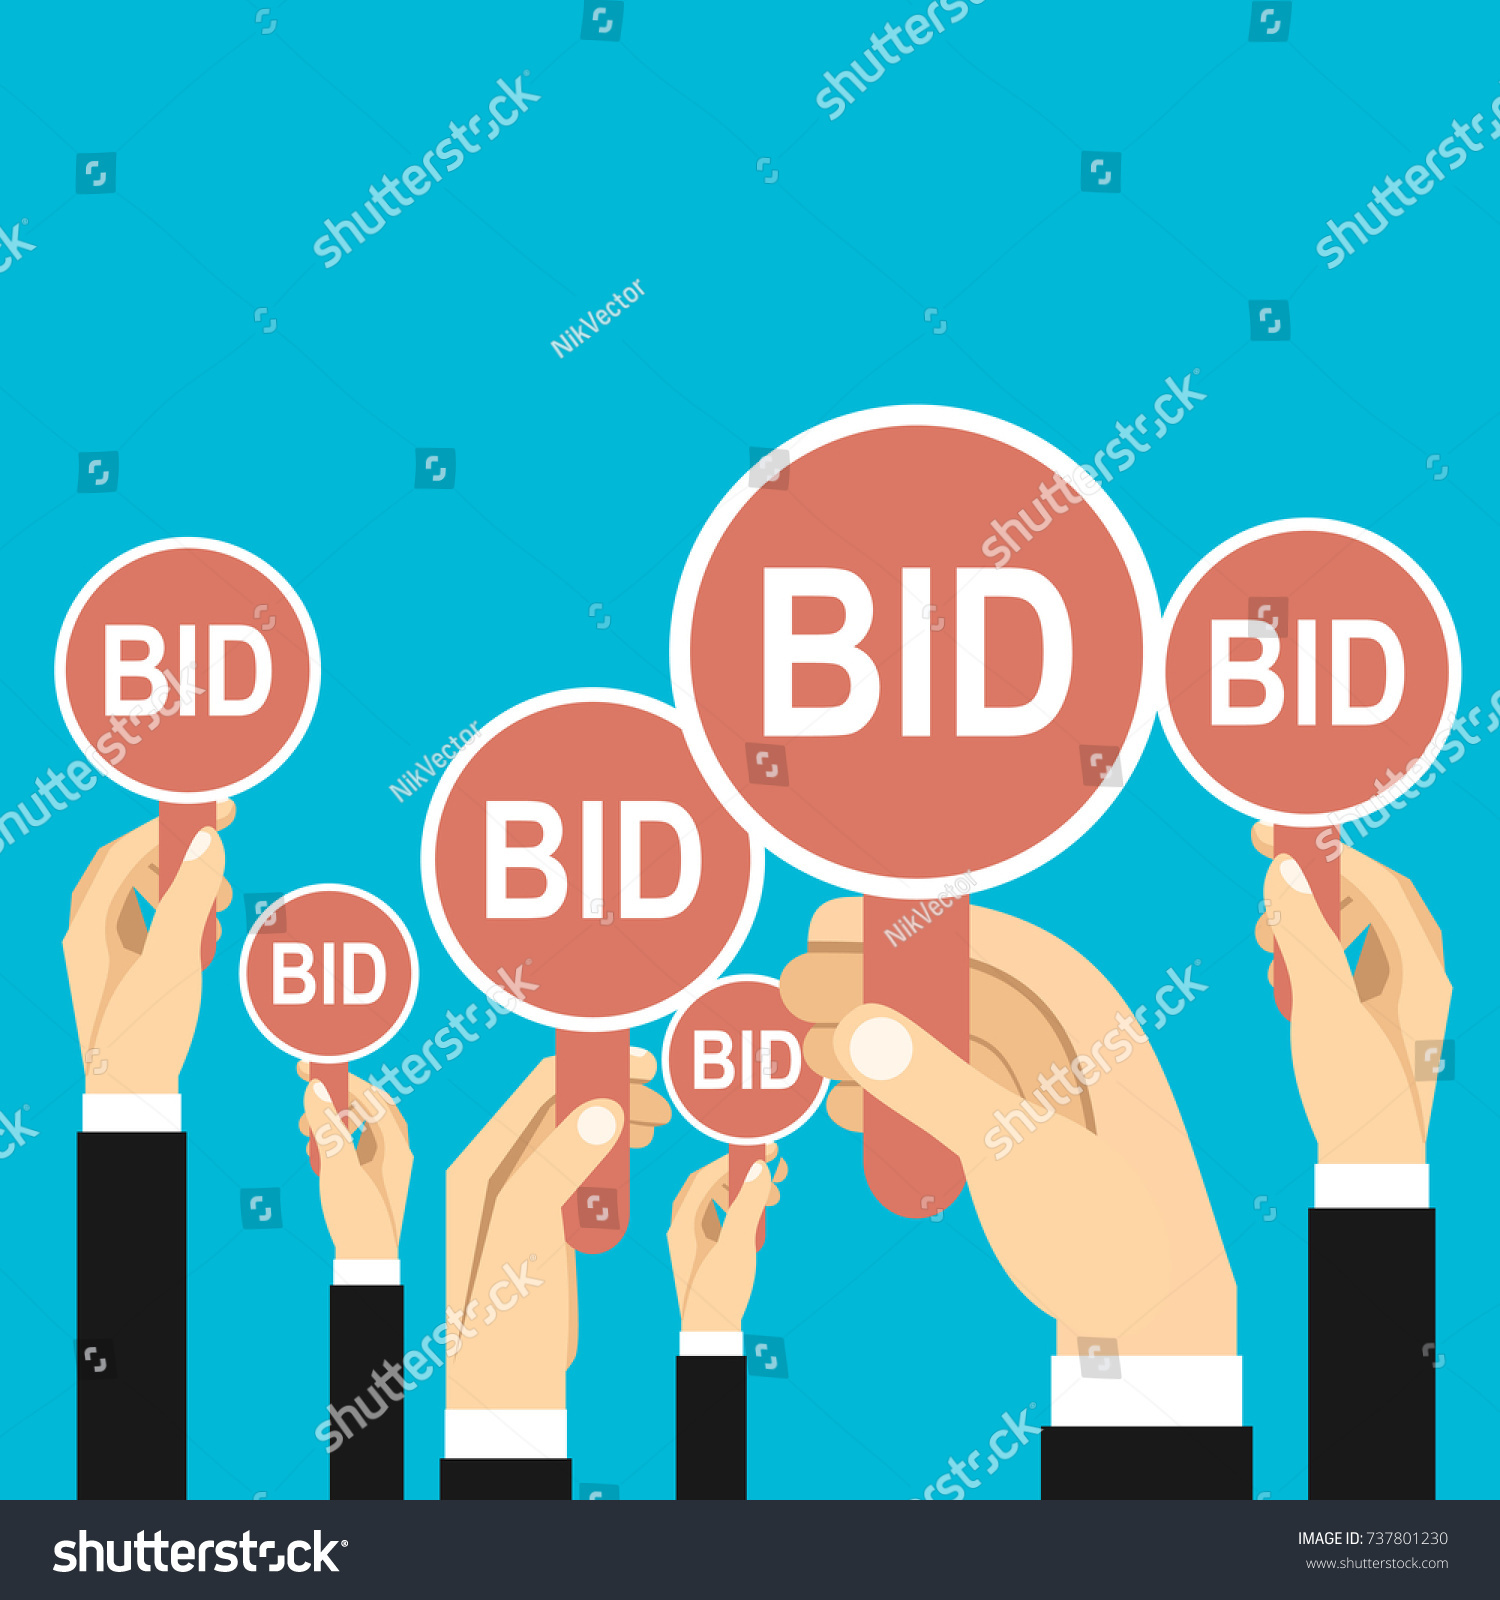 bid card template